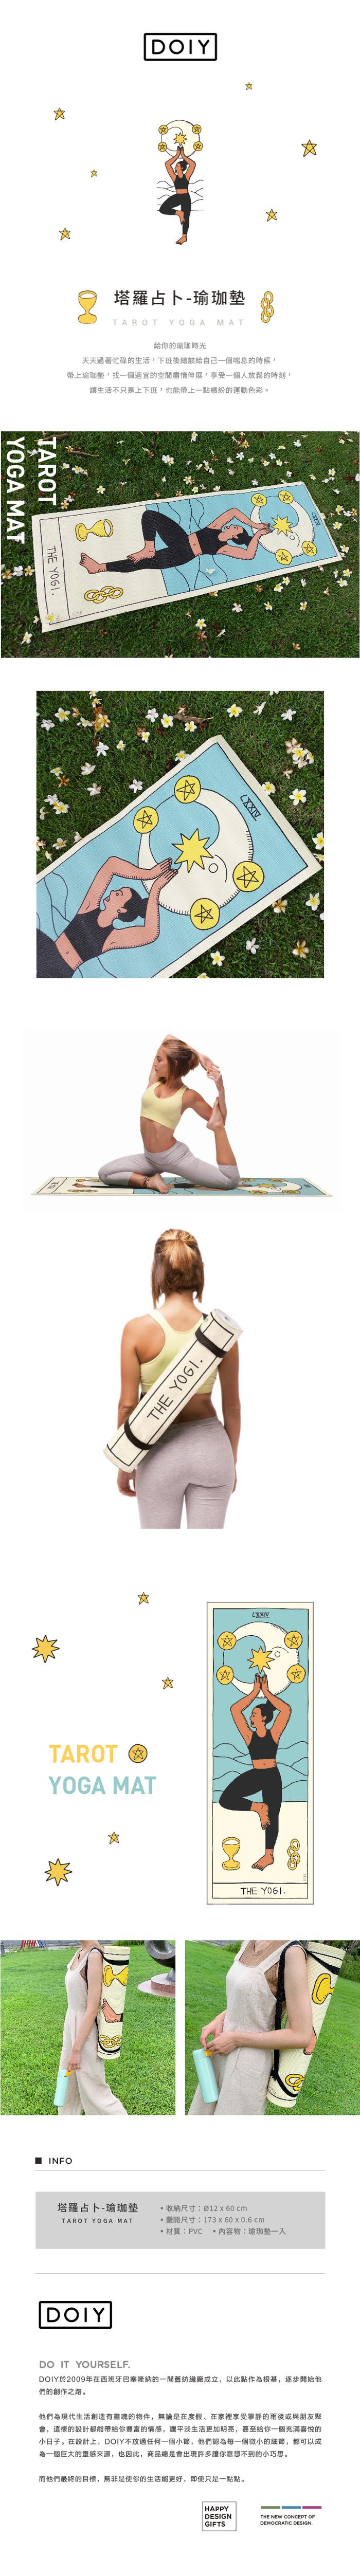 DOIY|塔羅占卜-瑜珈墊